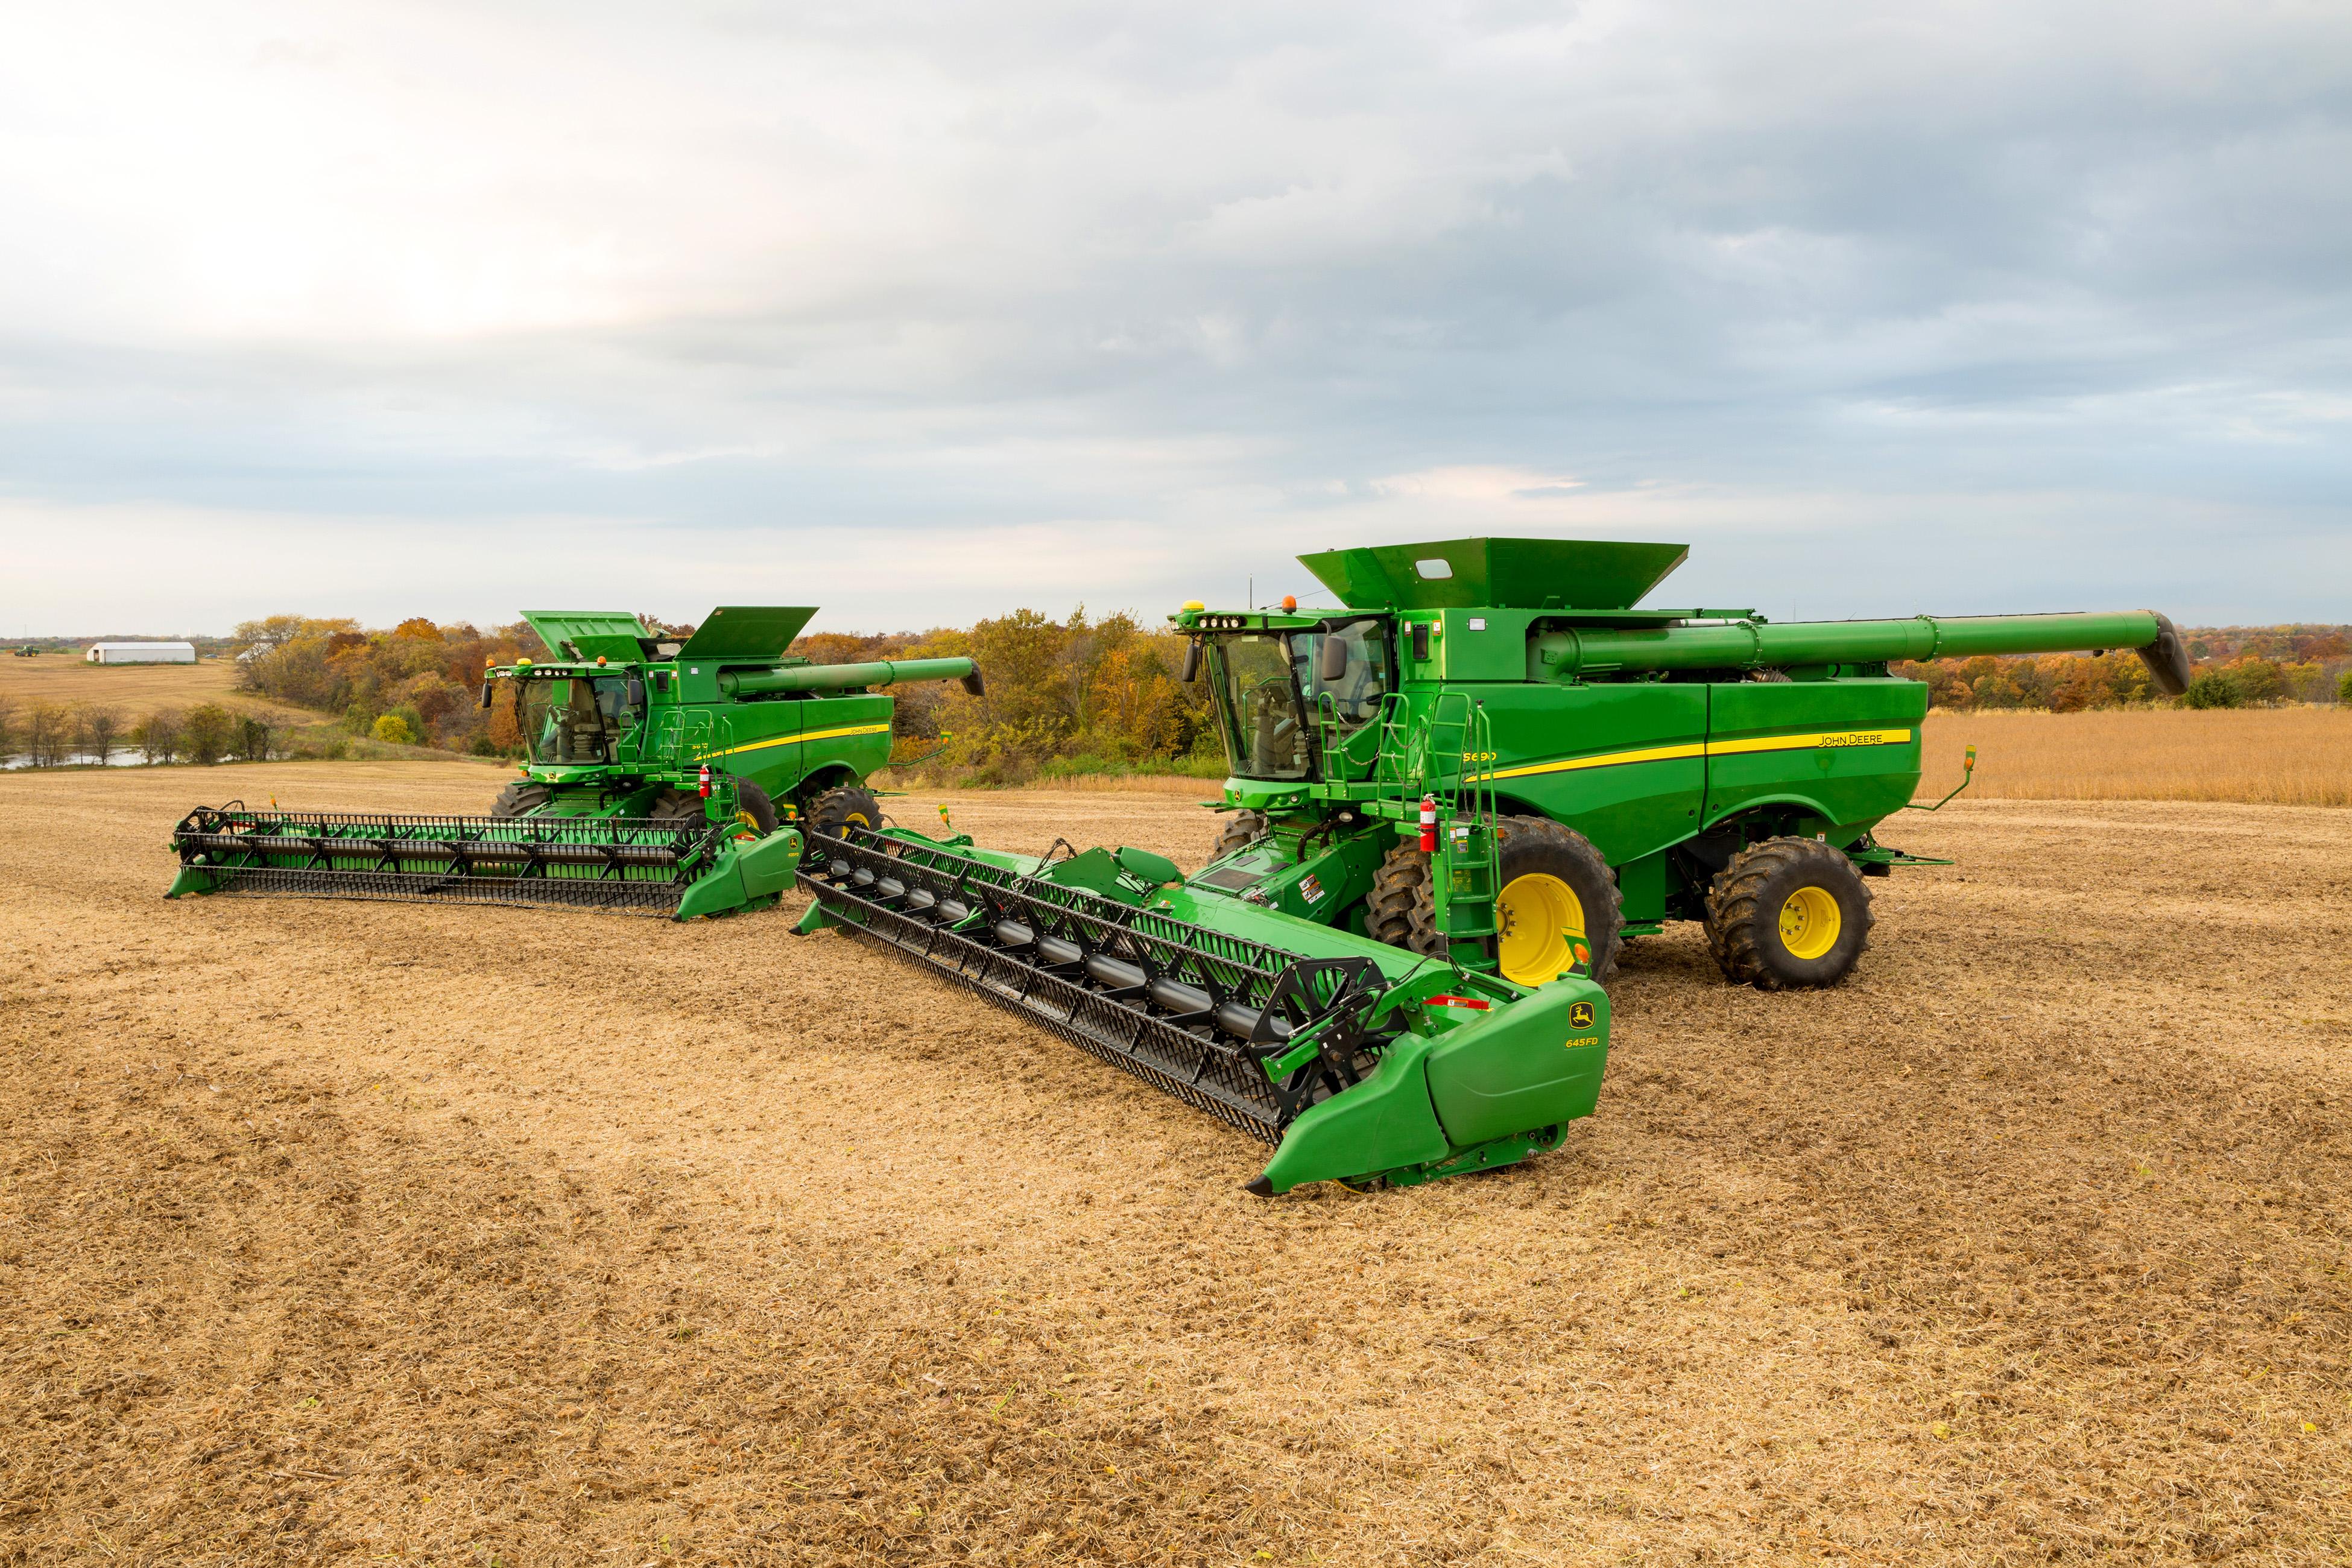 John Deere Announces Extensive Enhancements to Harvesting Equipment